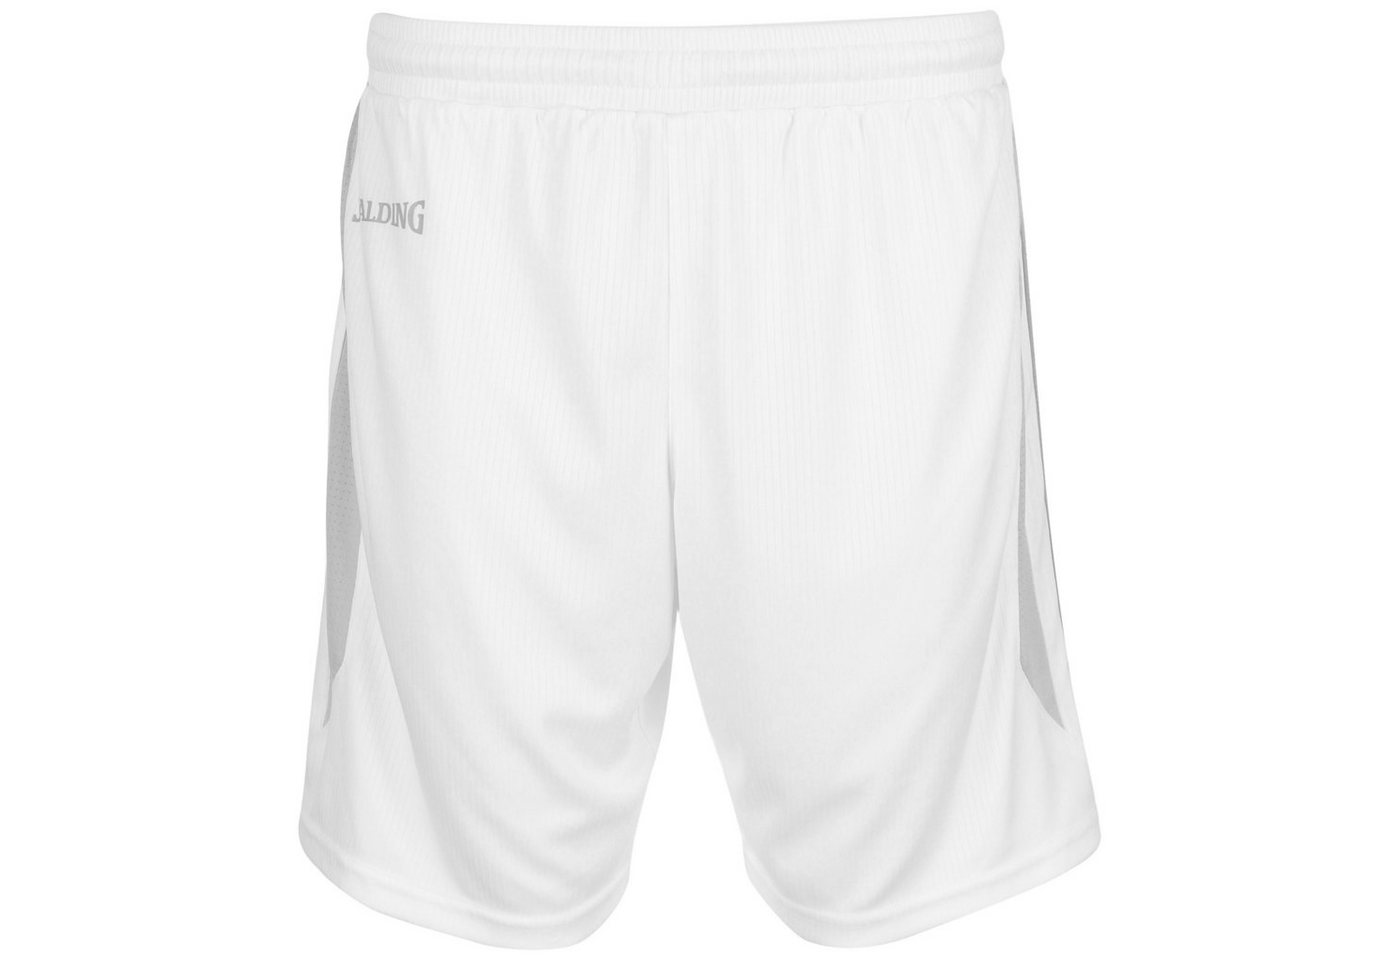 Spalding 4her III Basketballshort Damen | Sportbekleidung > Sporthosen > Basketballshorts | Weiß | Spalding